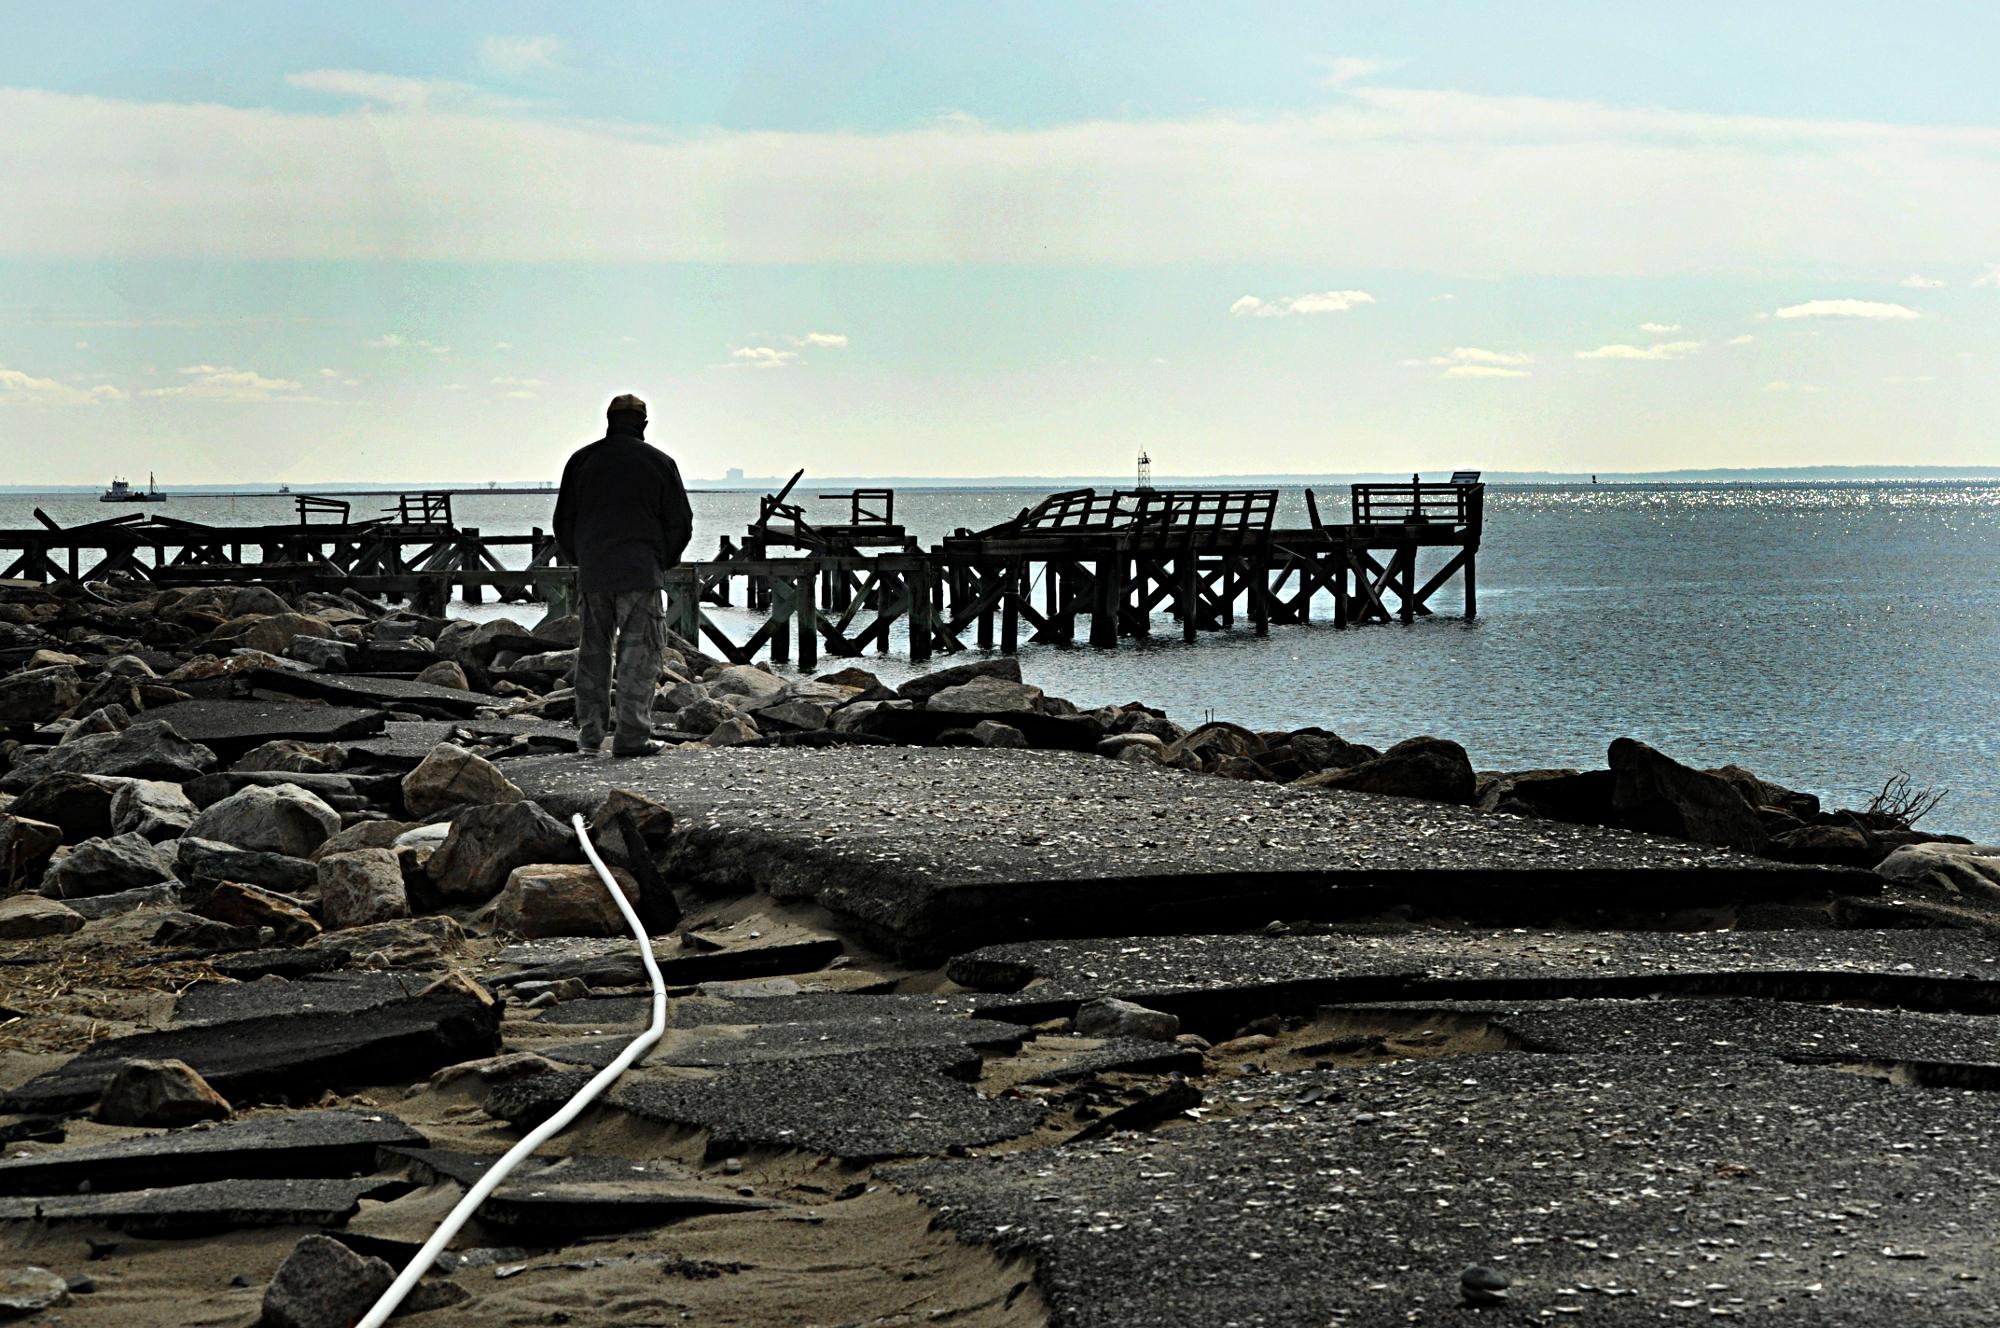 Pier in norwalk photo